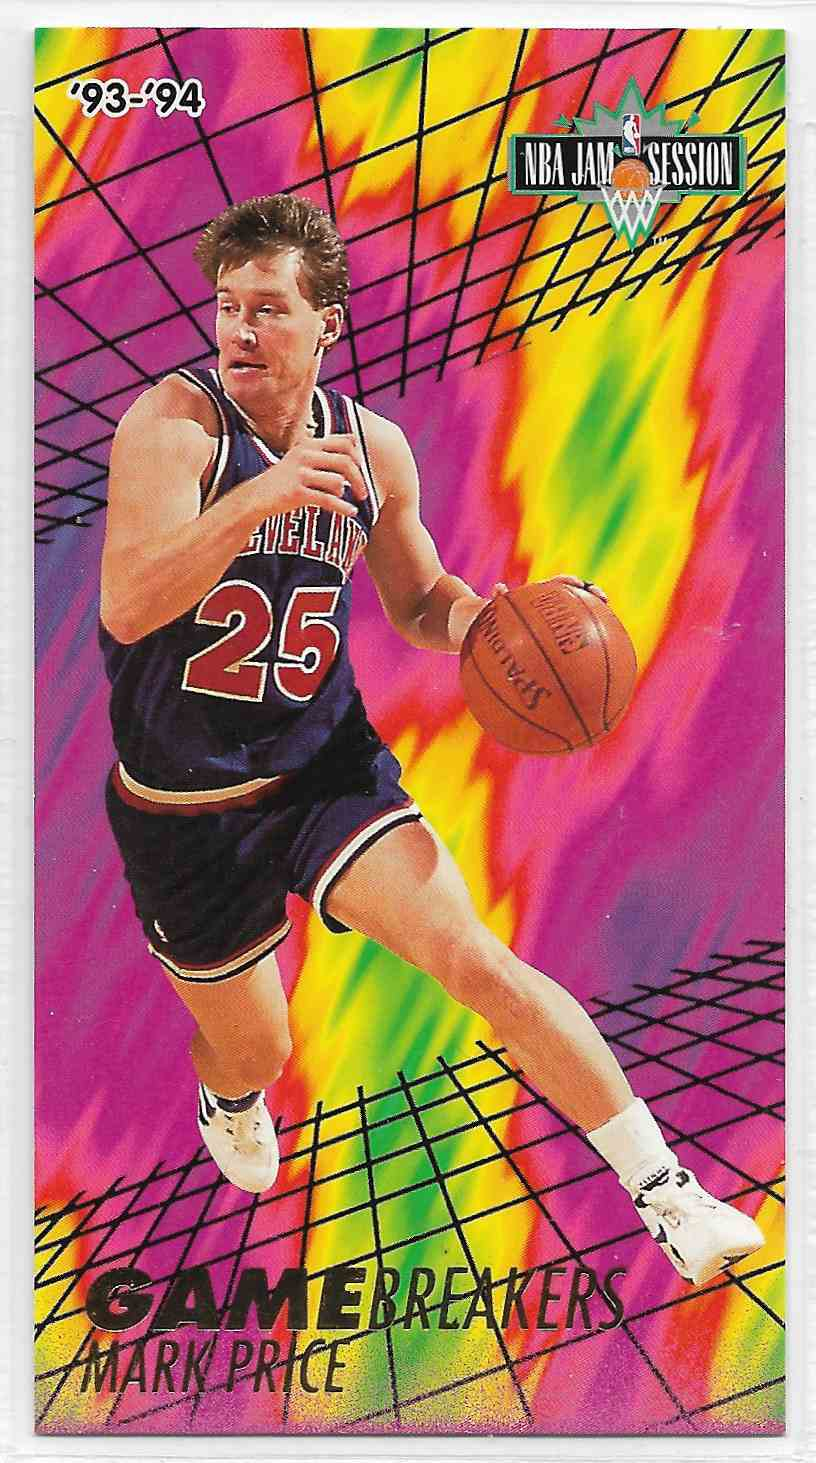 1993-94 Fleer NBA Jam Session Mark Price #6 card front image